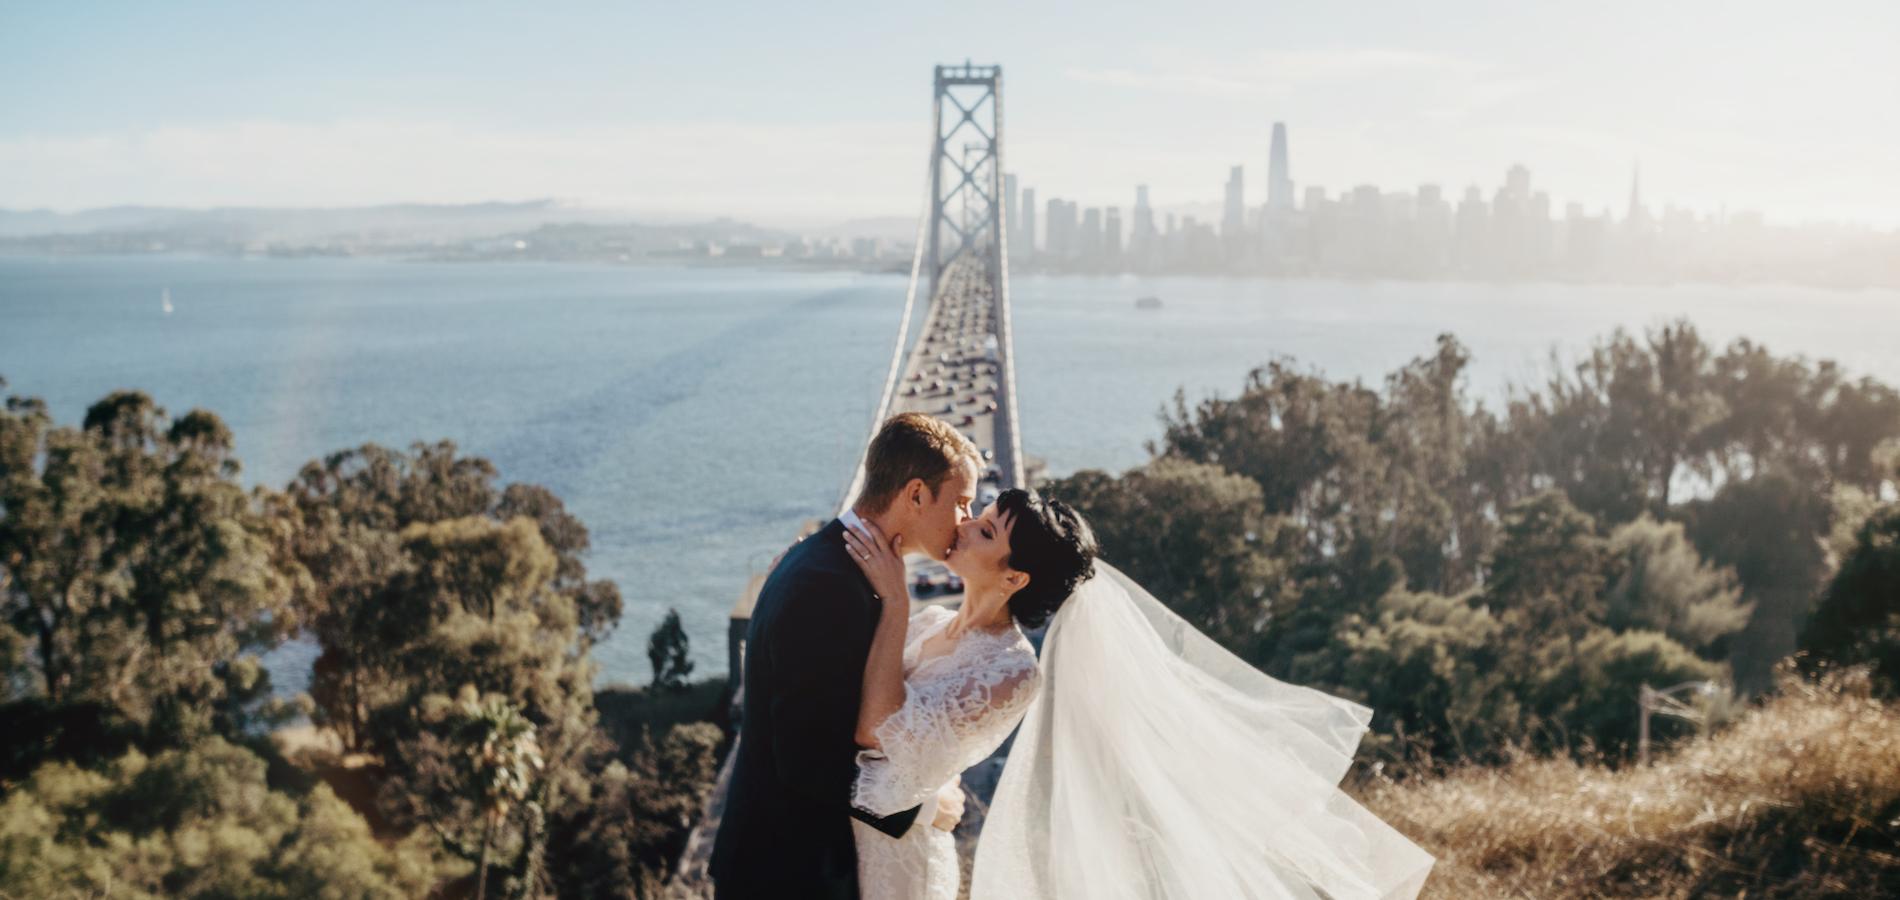 Photo of bride and groom taken using wedding photography tips